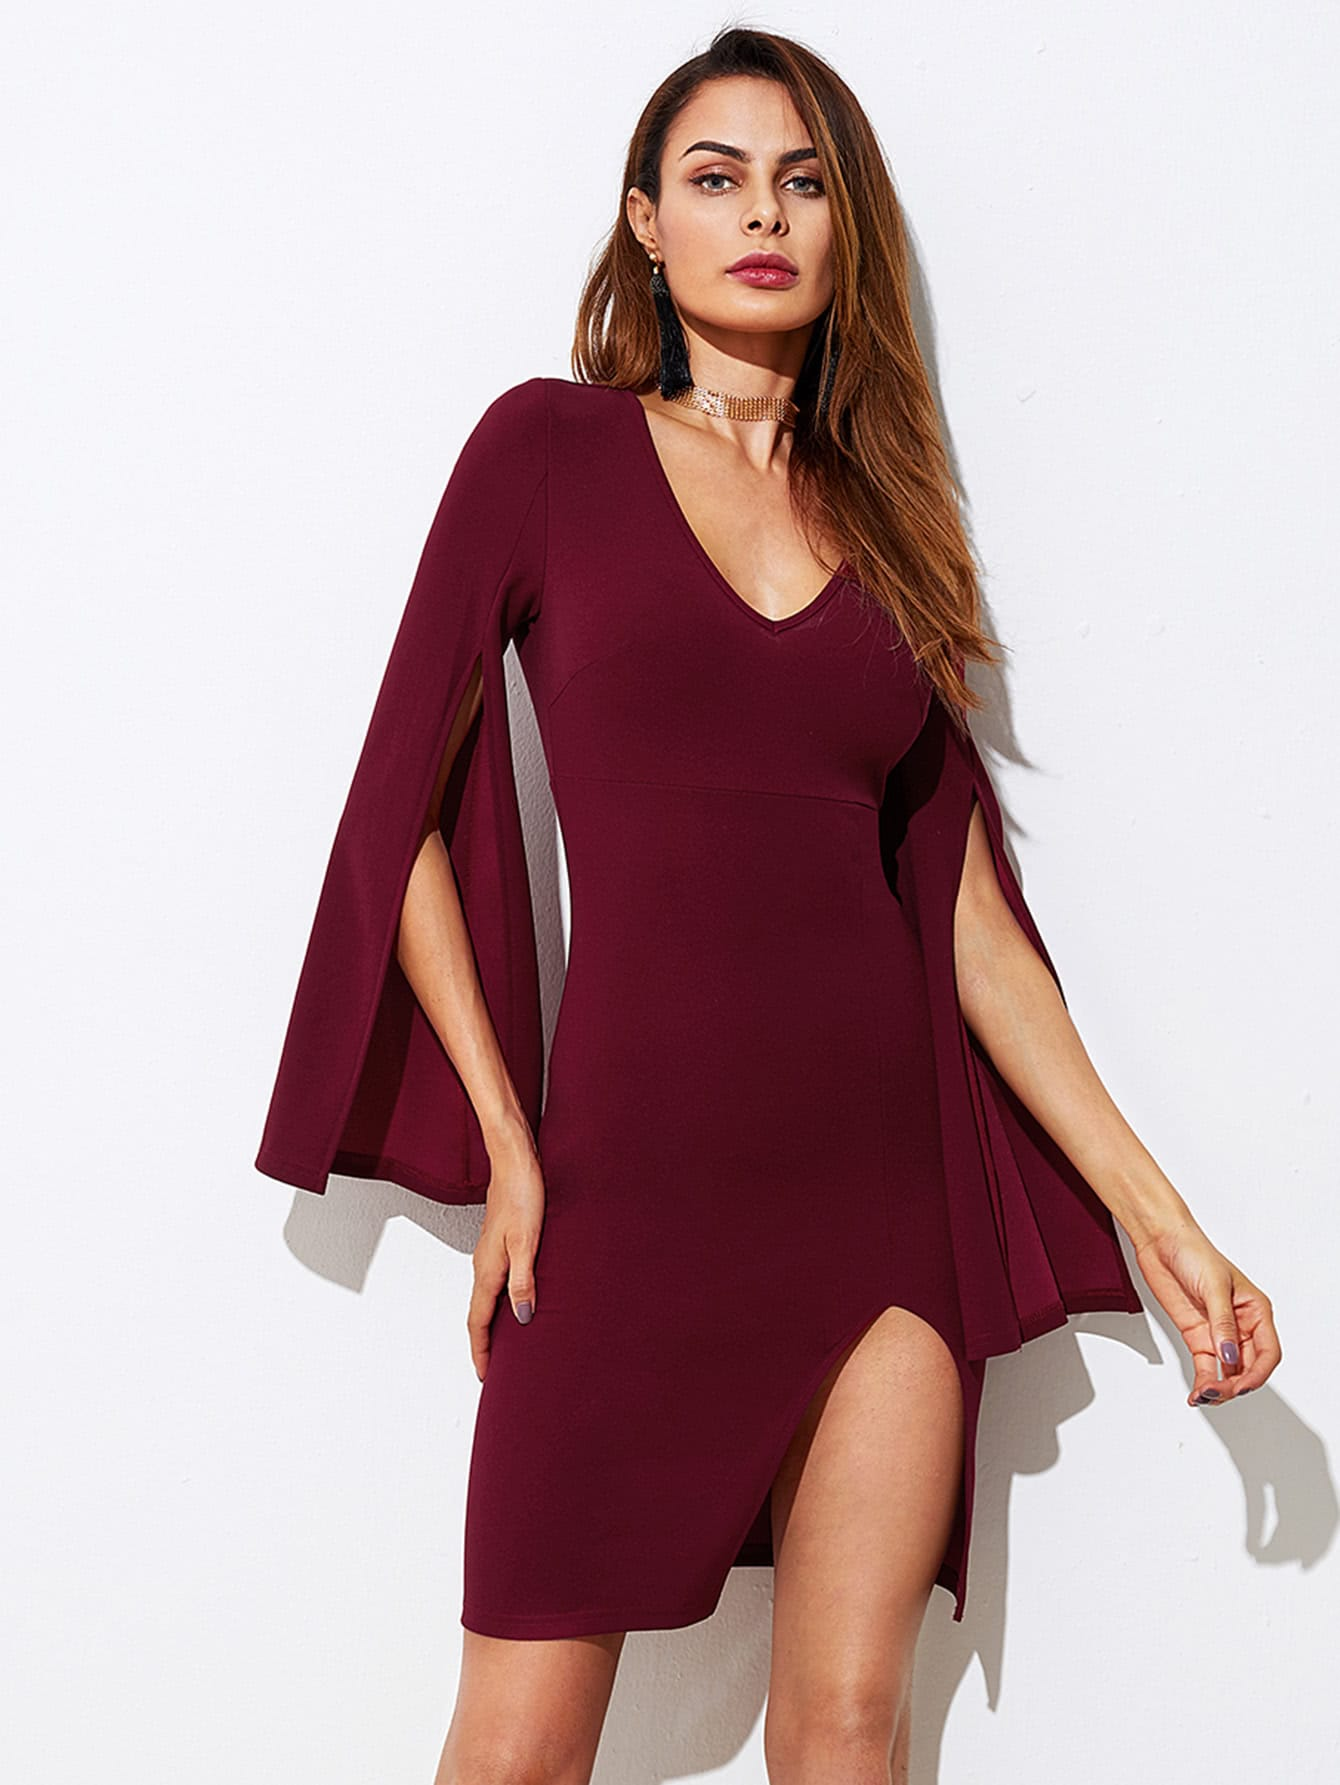 Split Form Fitting Dress guipure lace form fitting dress